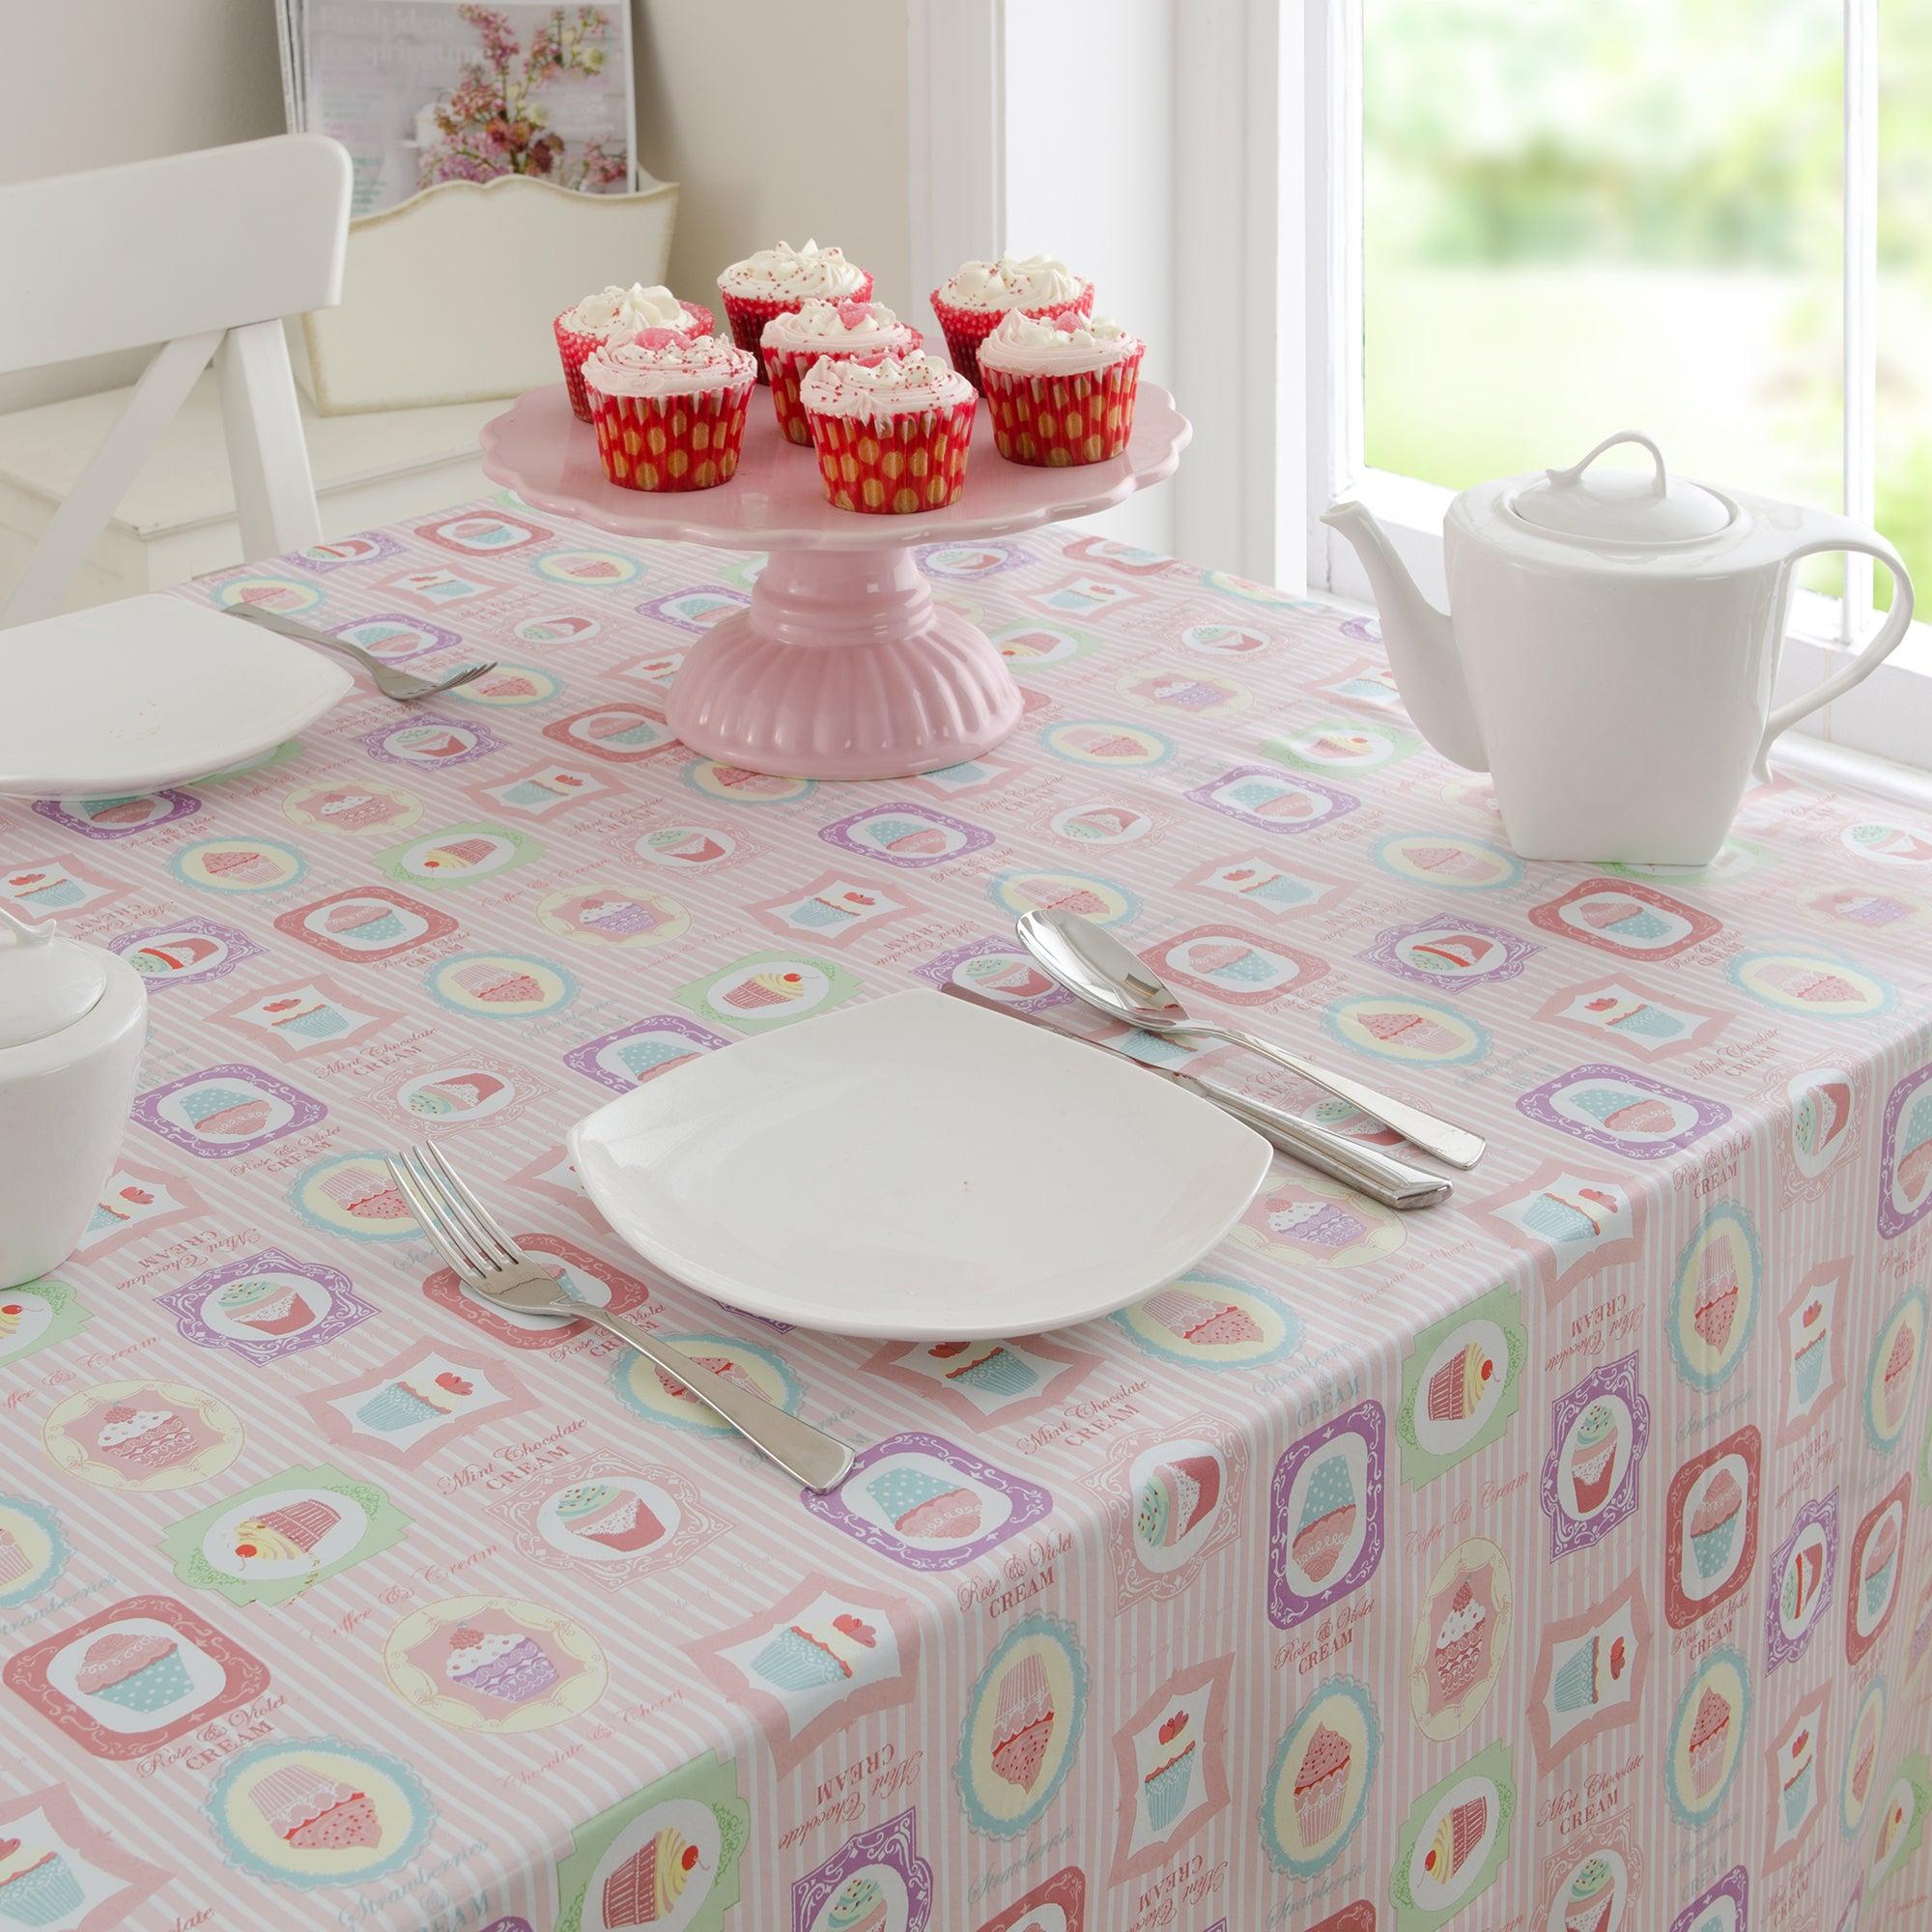 Tea Party Collection PVC Tablecloth